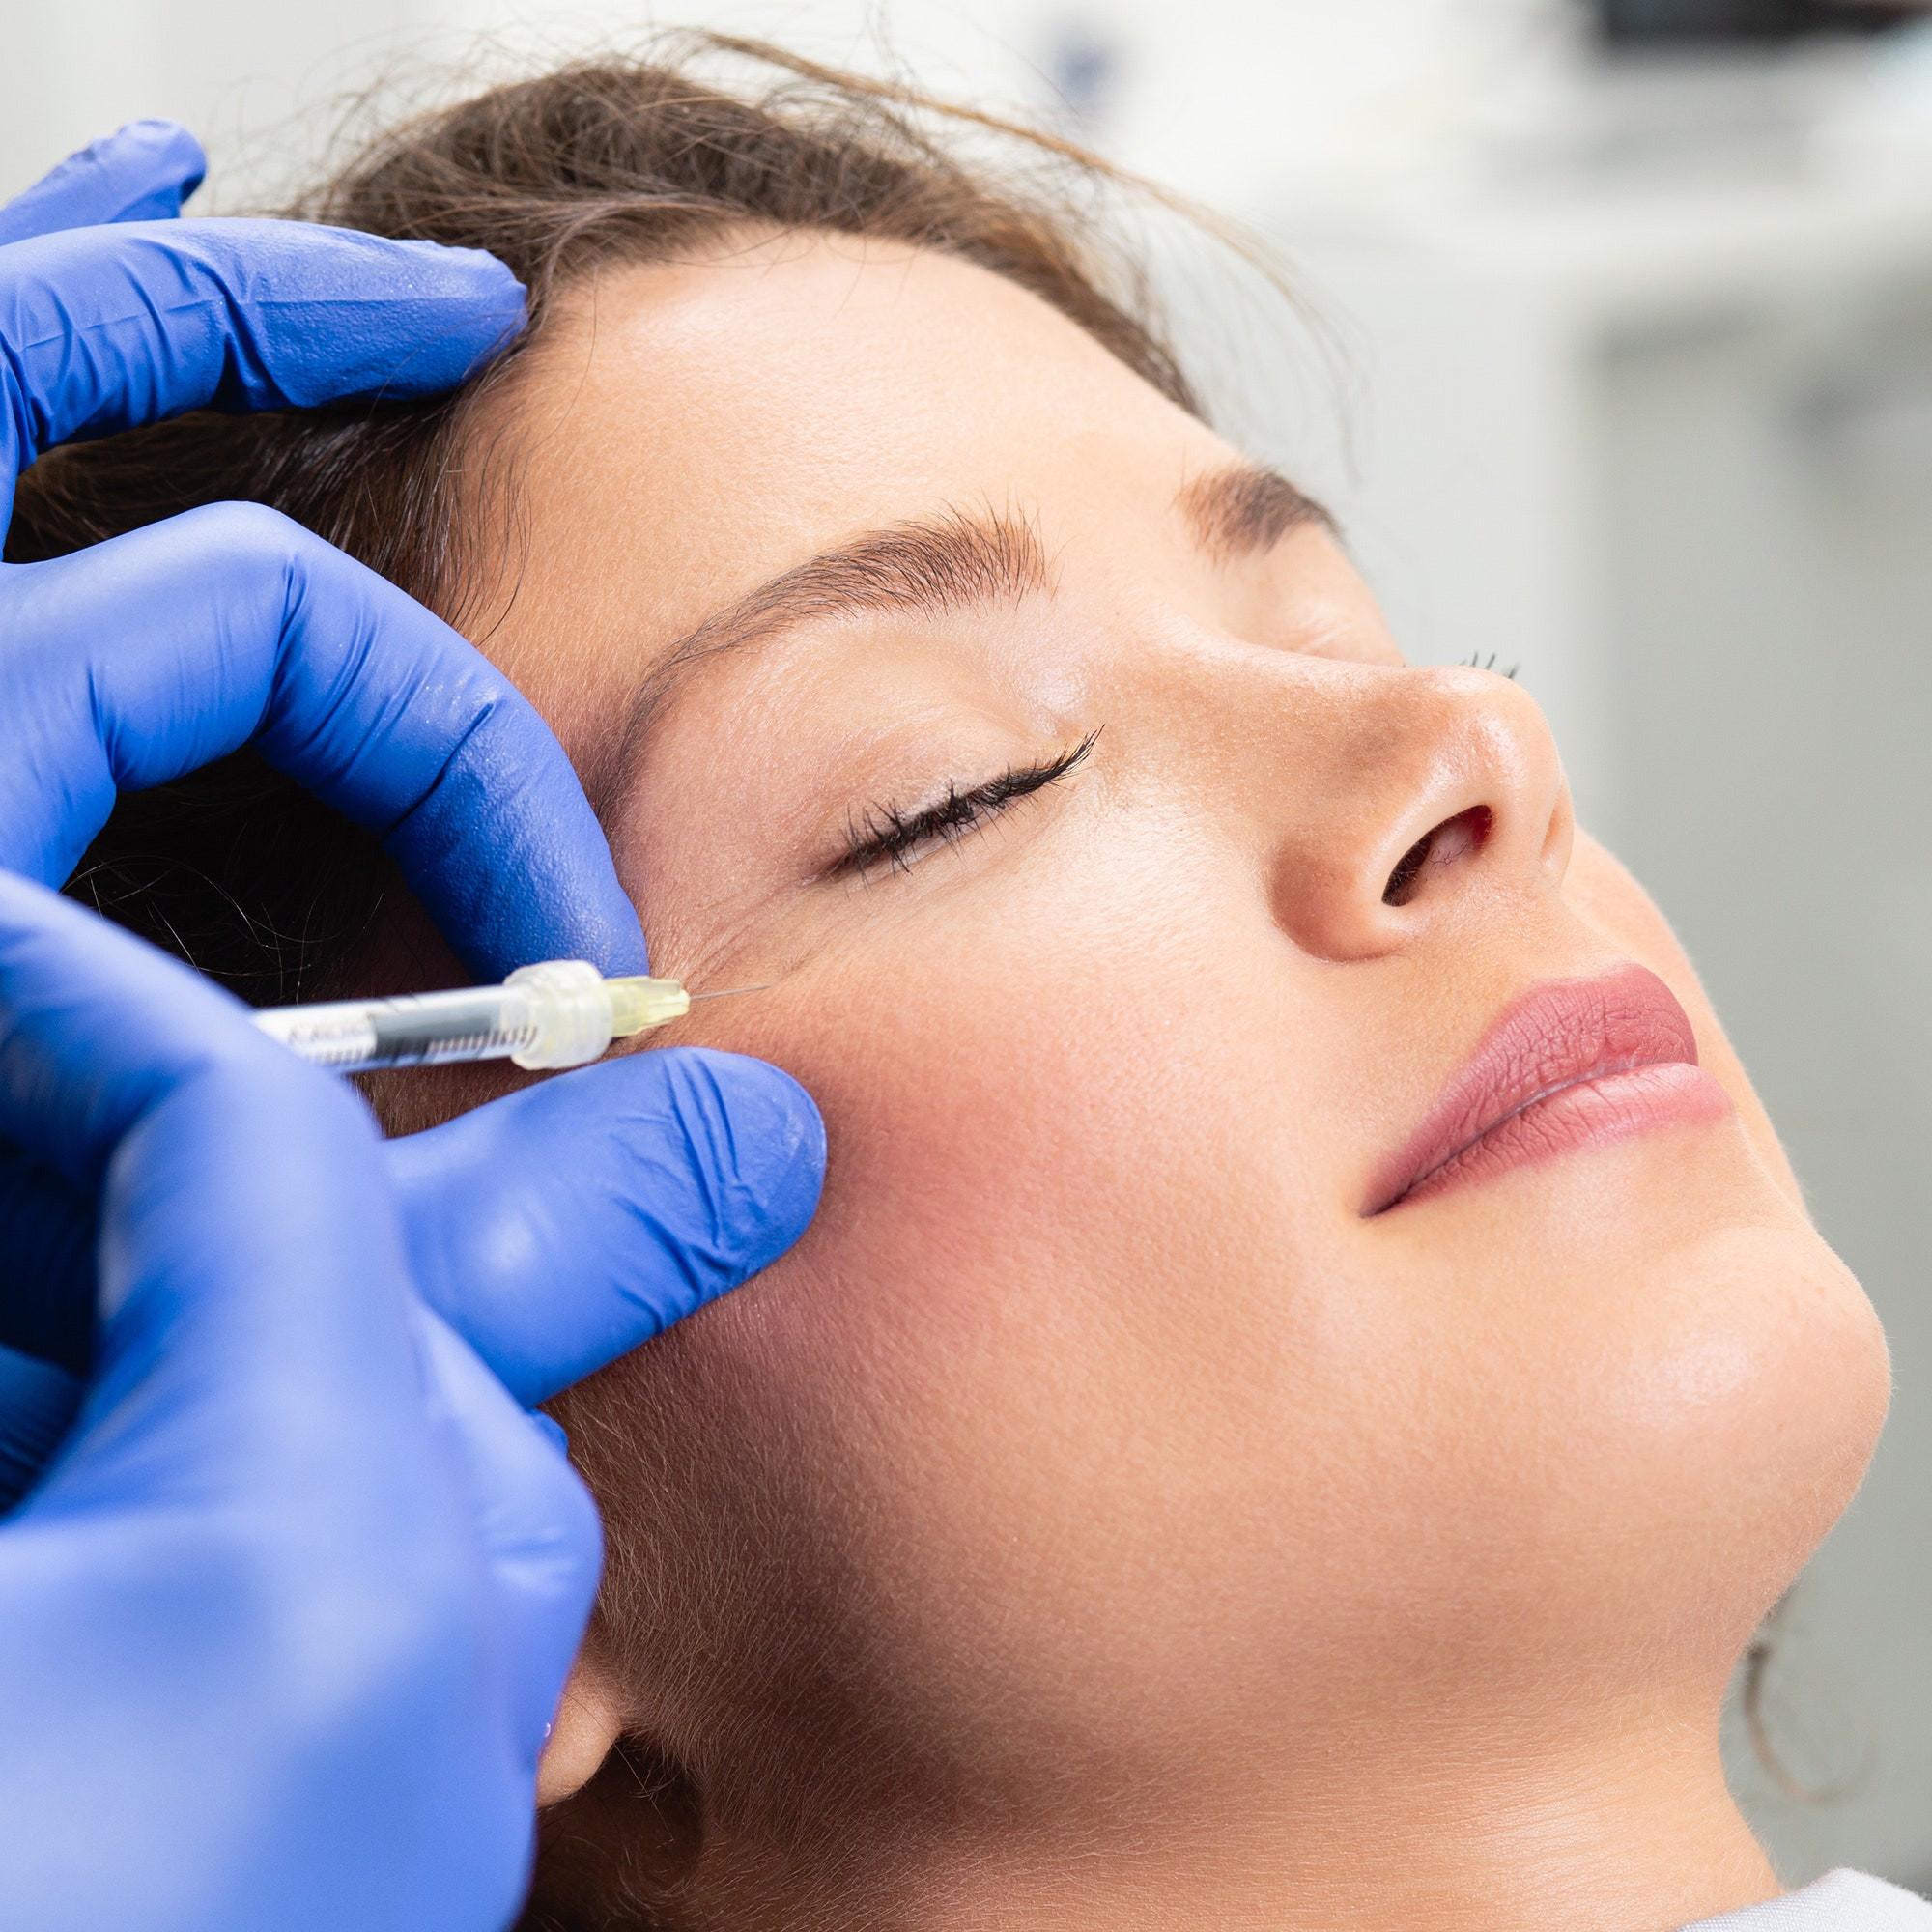 Neurotoxins:  Botox, Xeomin, and Dysport